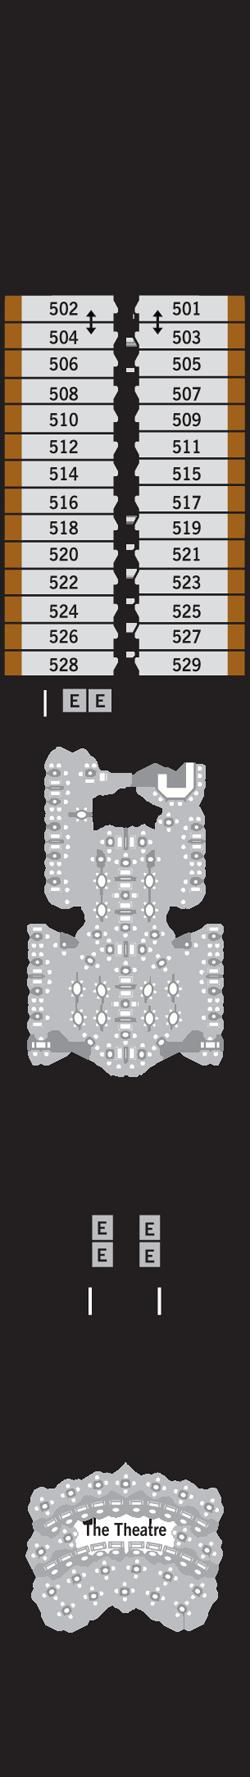 Silver Muse Deck 5: Deck 5